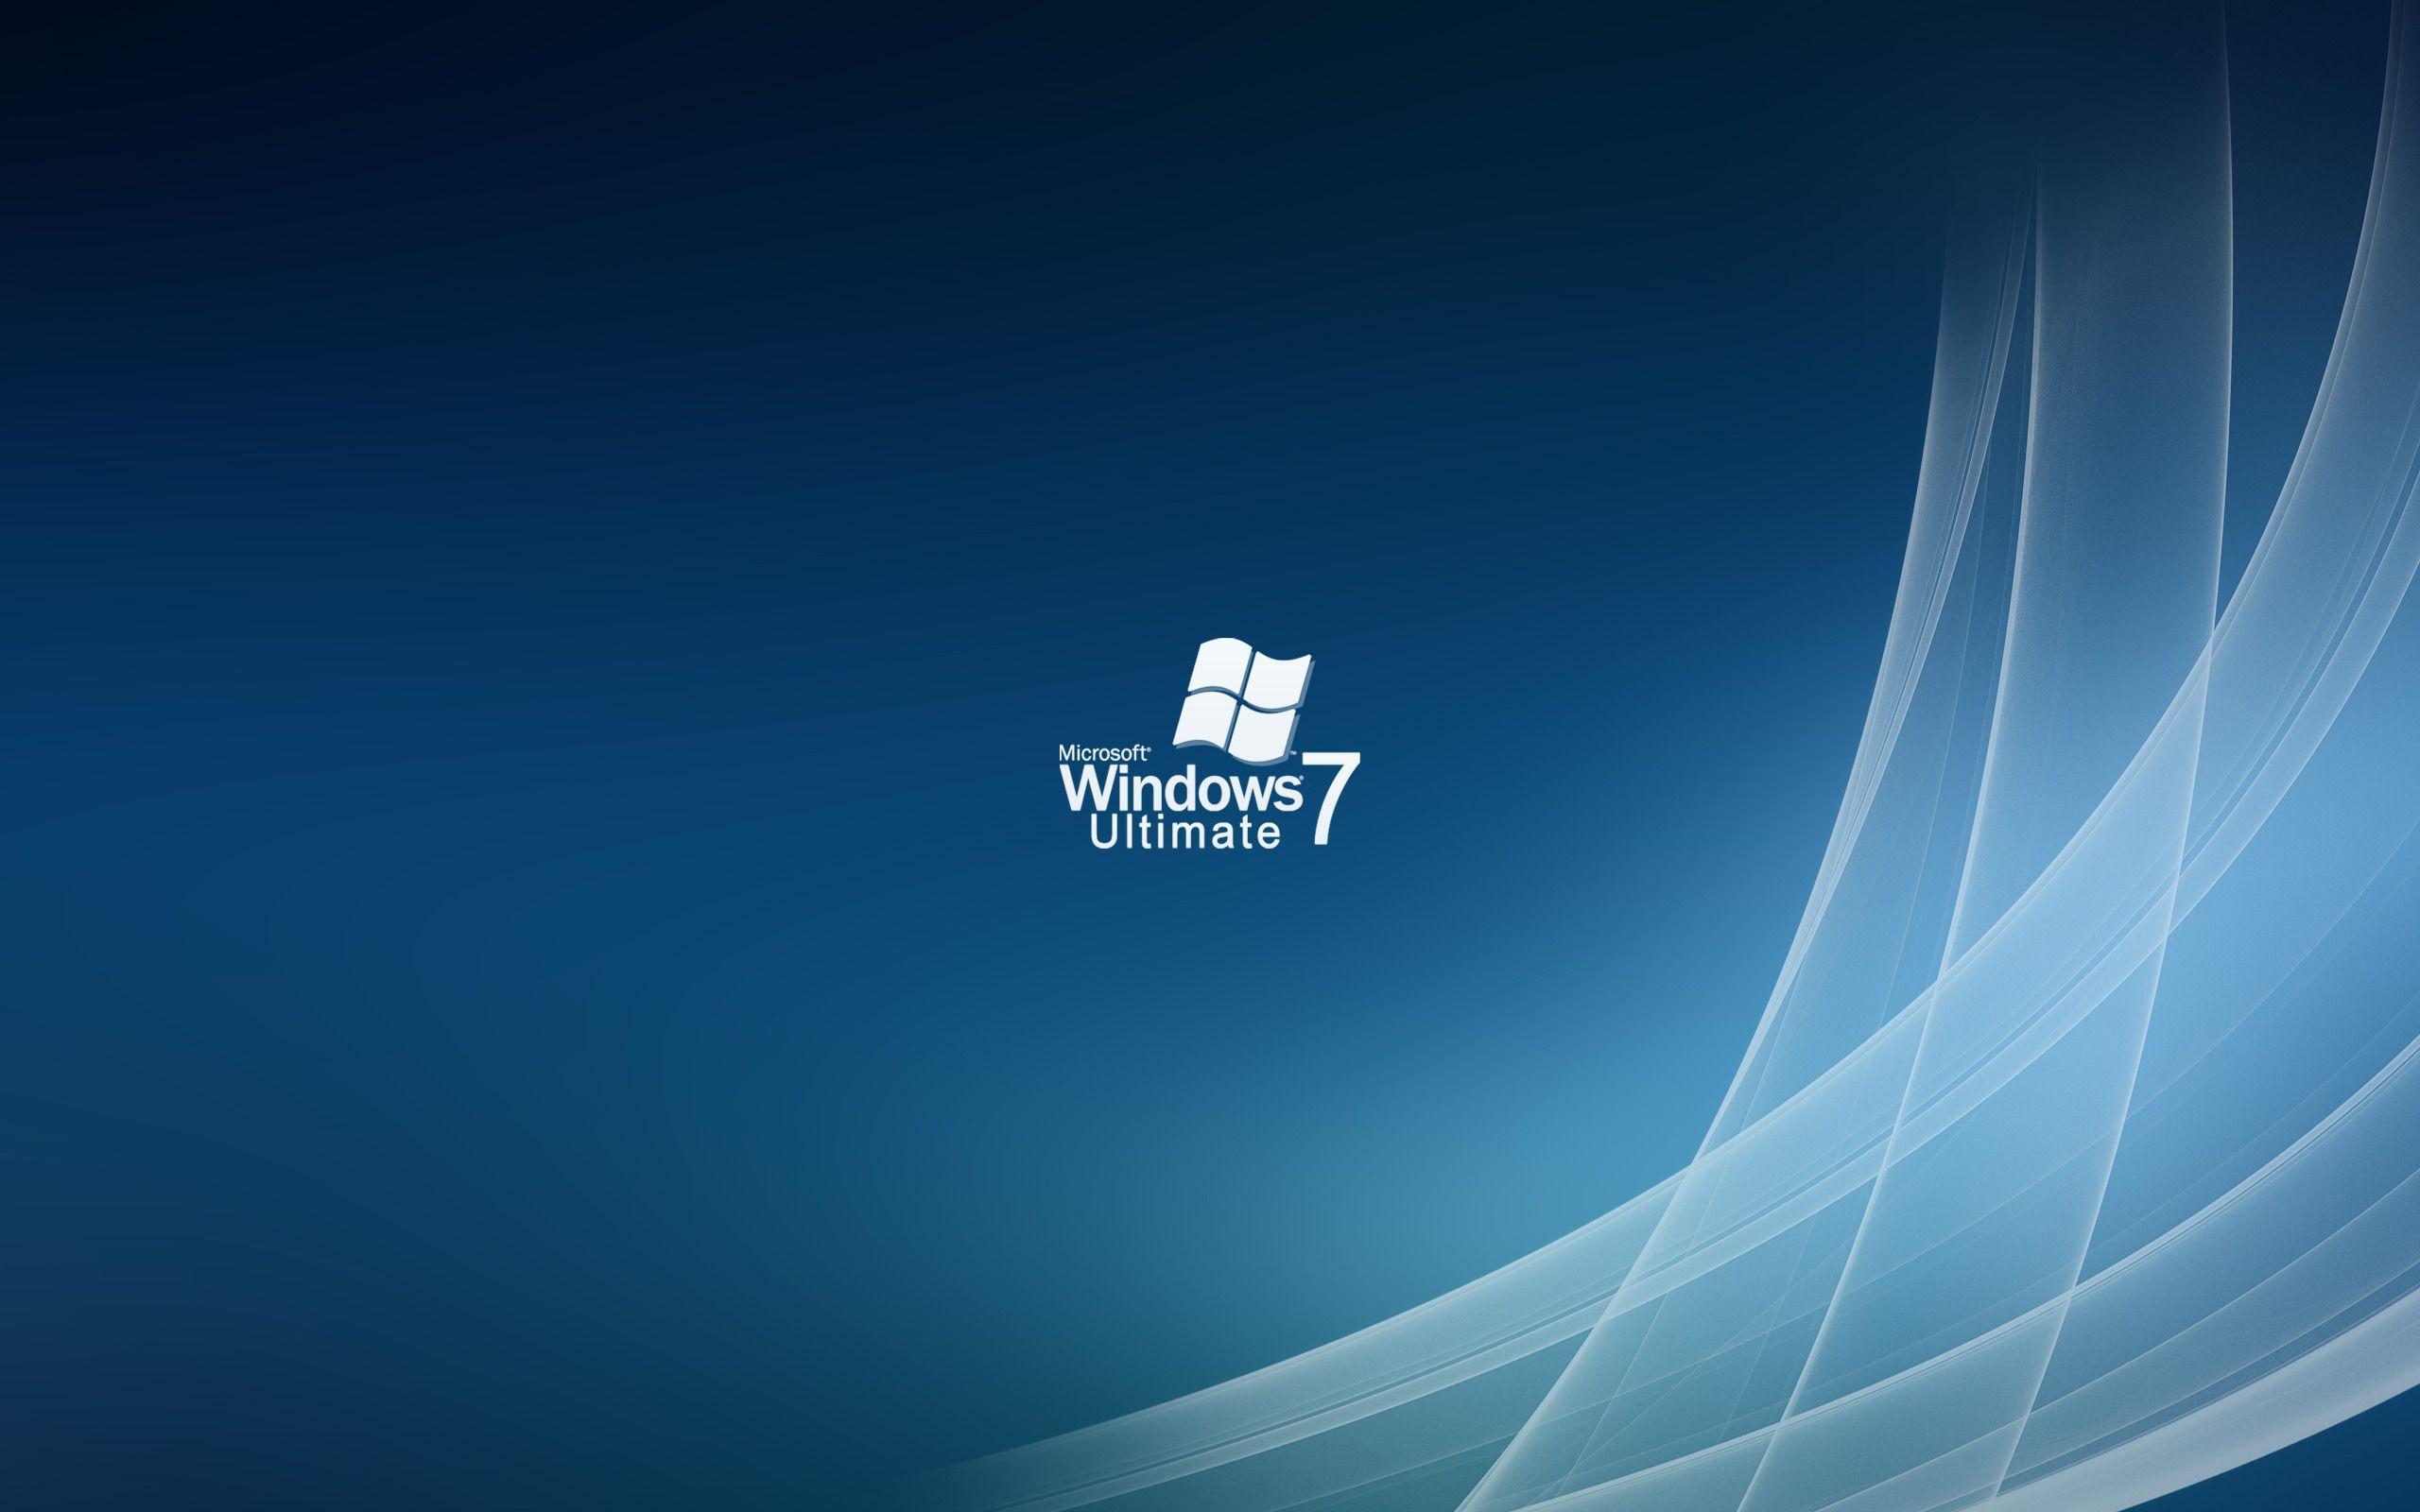 Windows 7 Professional Desktop Wallpapers Top Free Windows